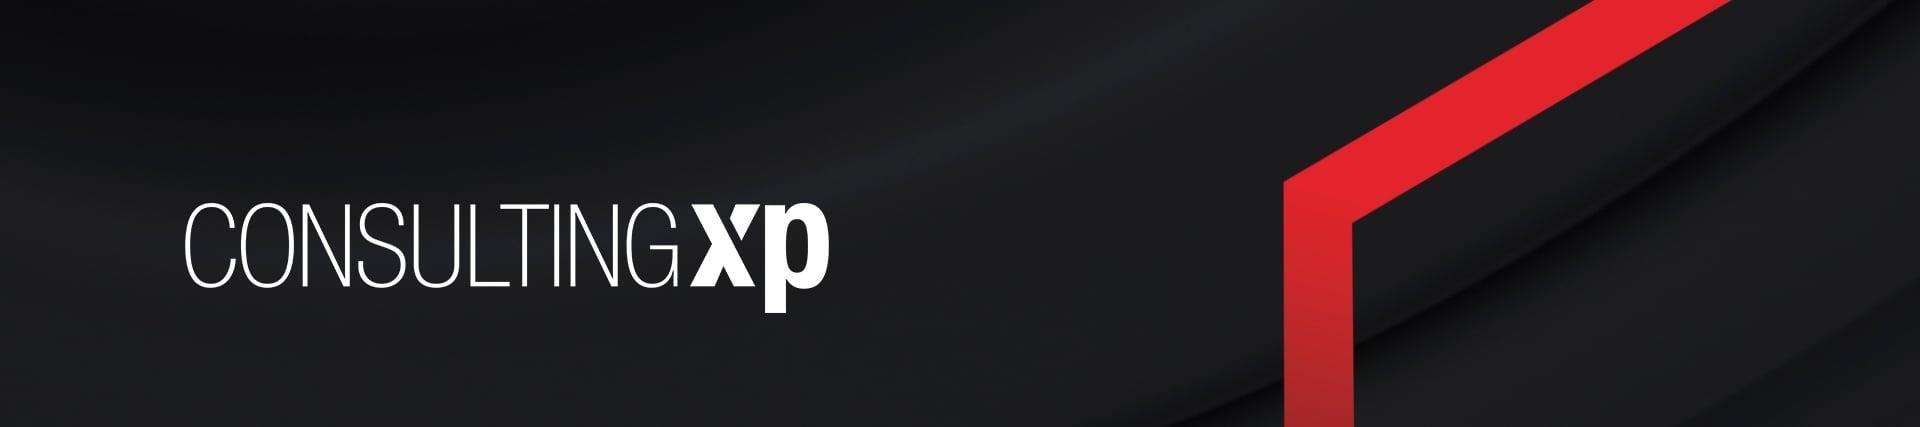 ConsultingXP